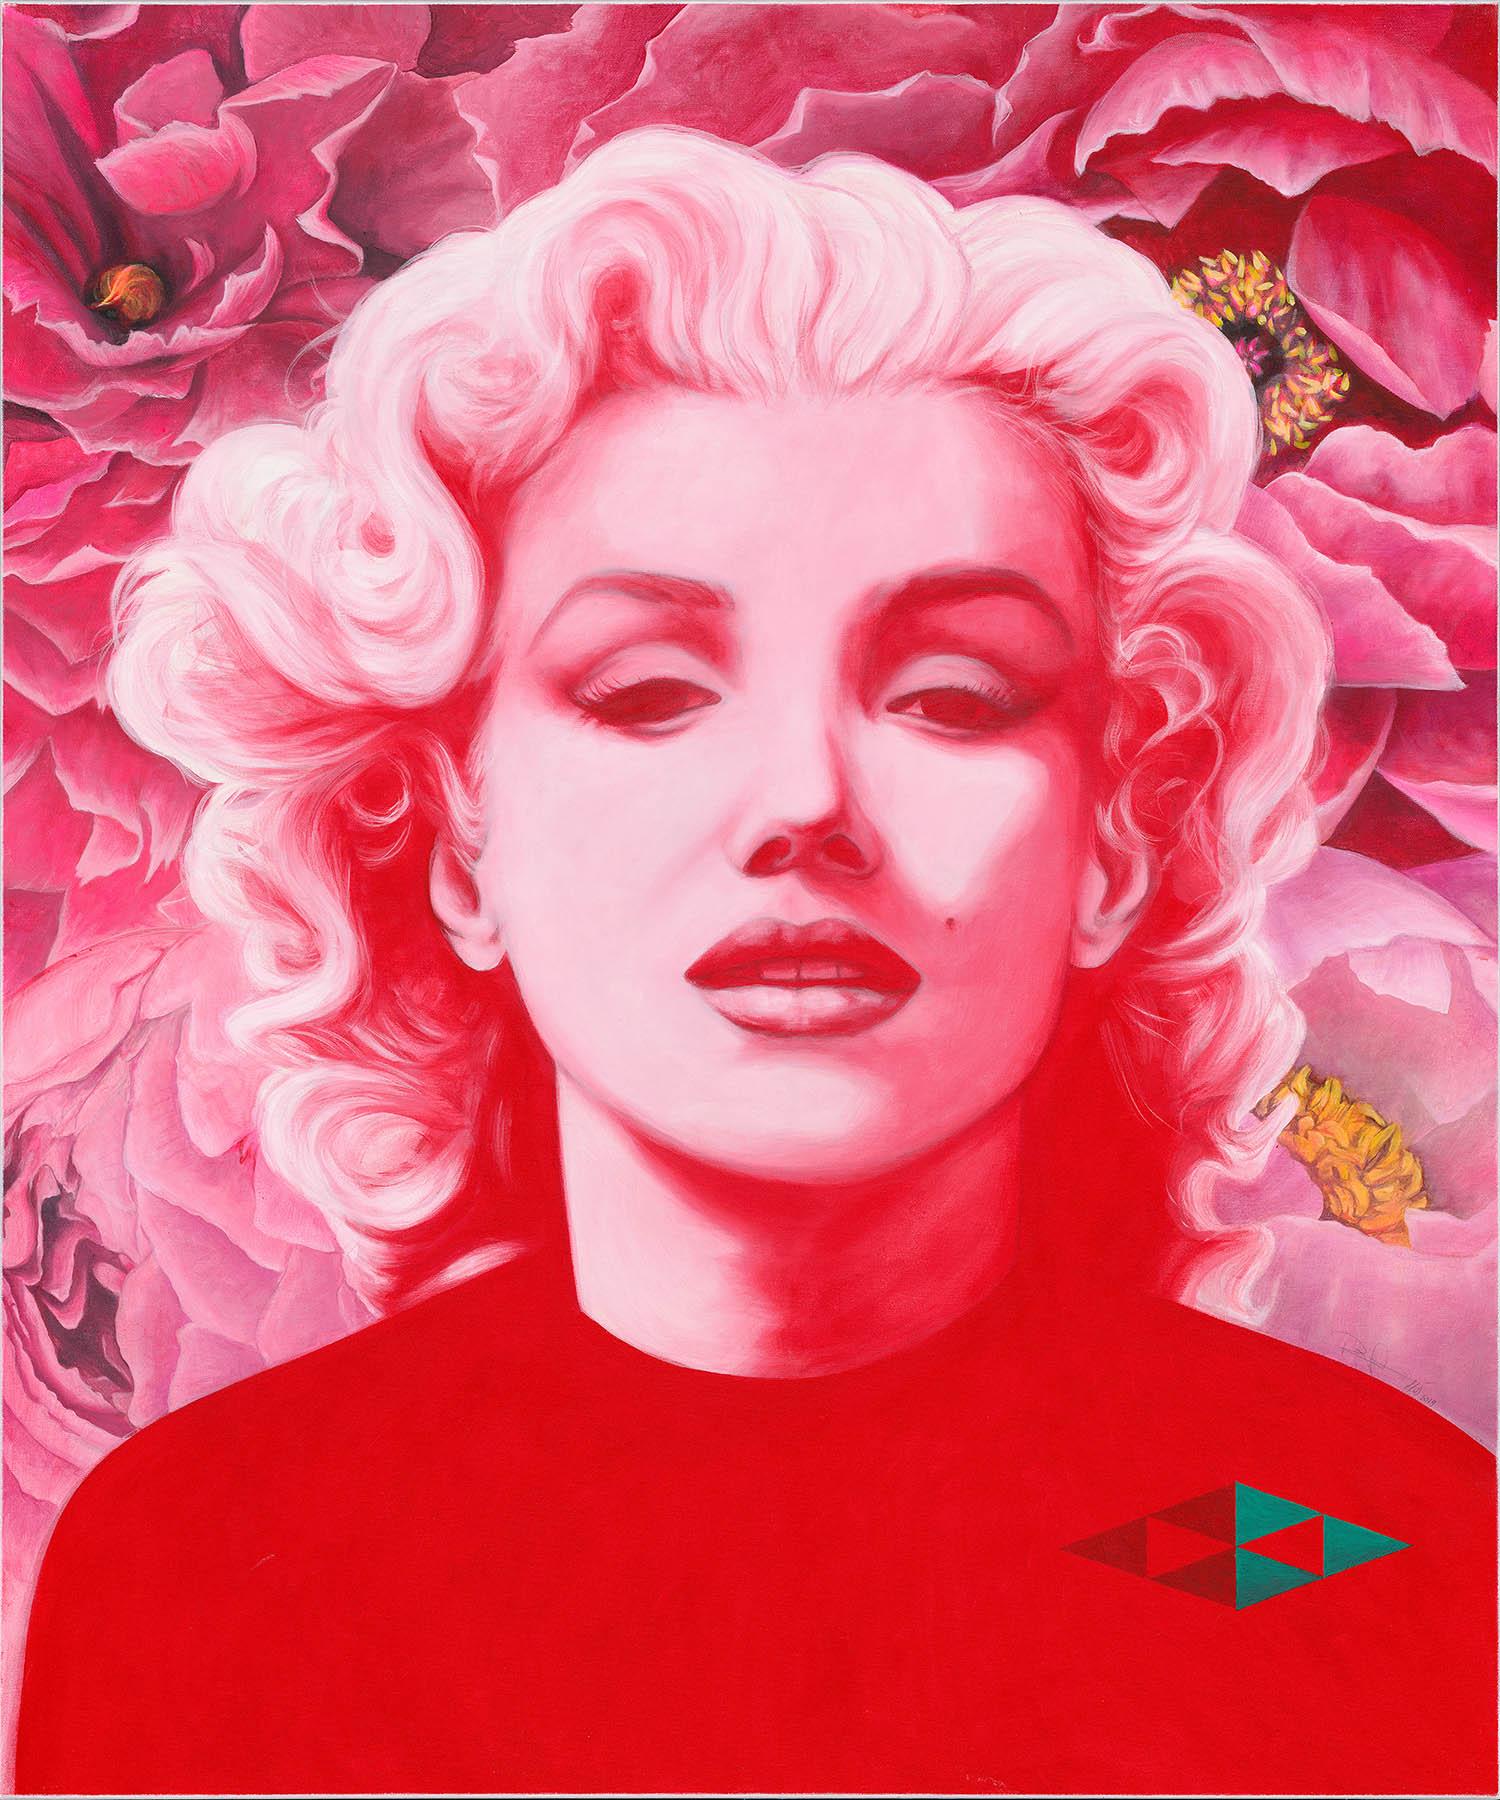 Norma Jean I / Acryl auf Leinwand 100x120cm © Rita Stern Miltenberg